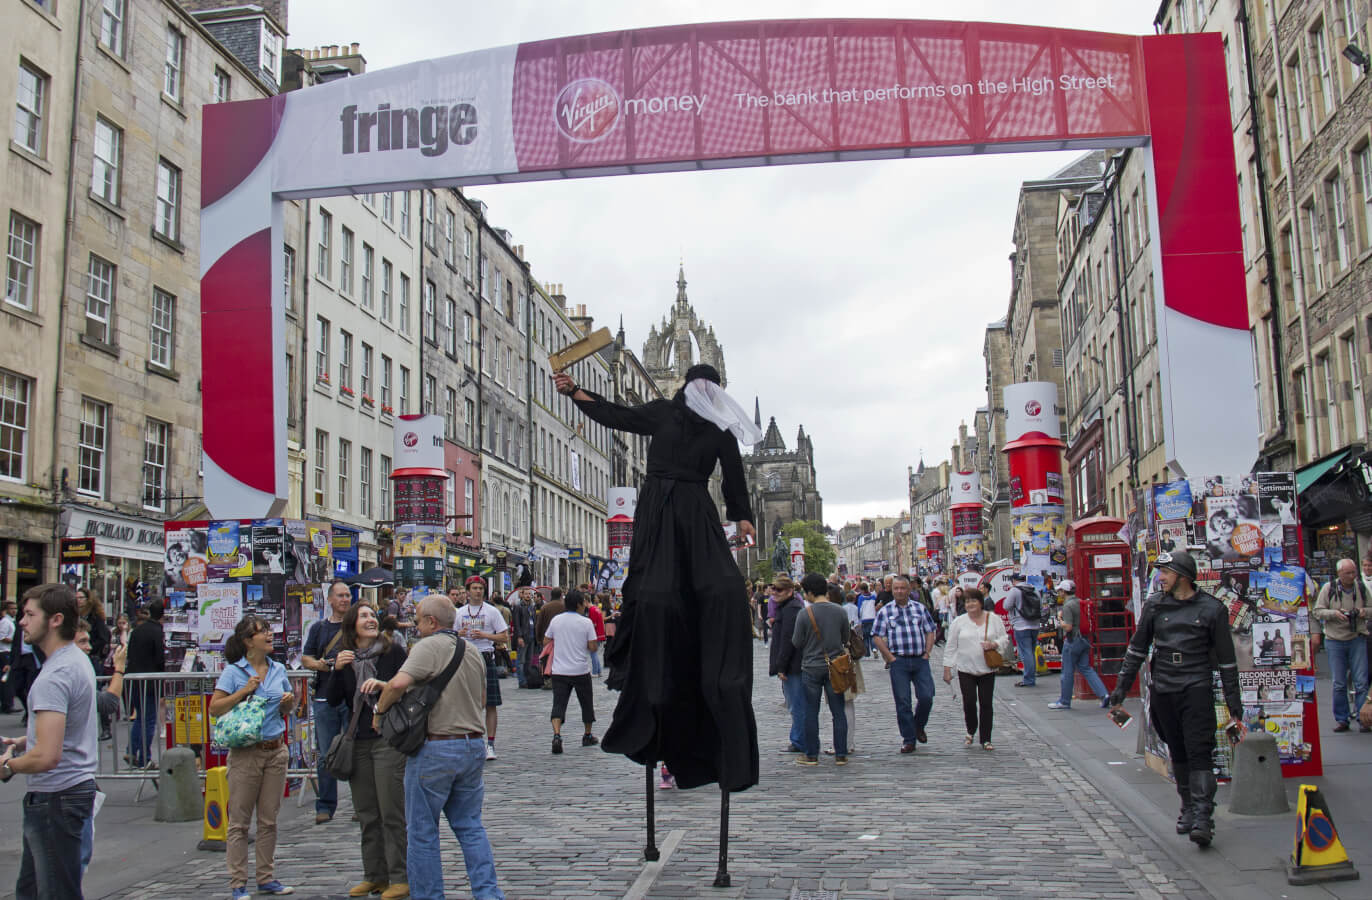 Get festive this summer at the 70th Edinburgh Fringe